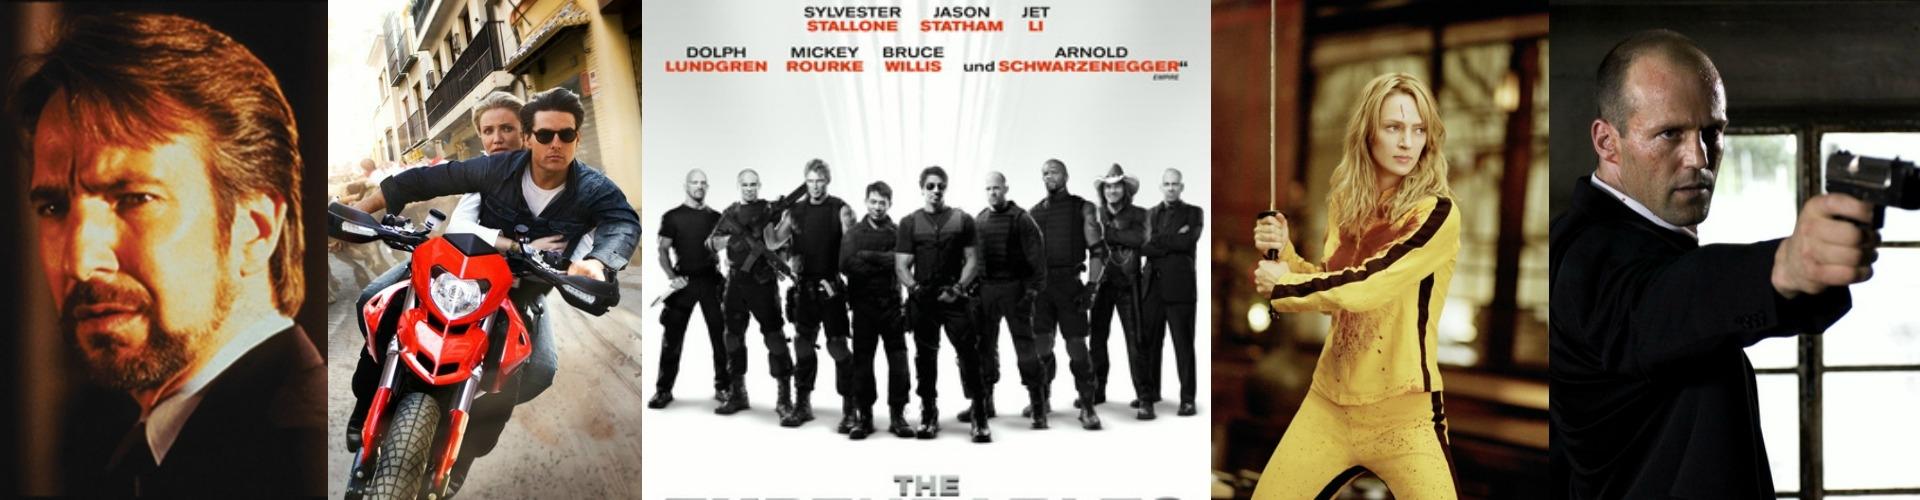 guter actionfilm 2016